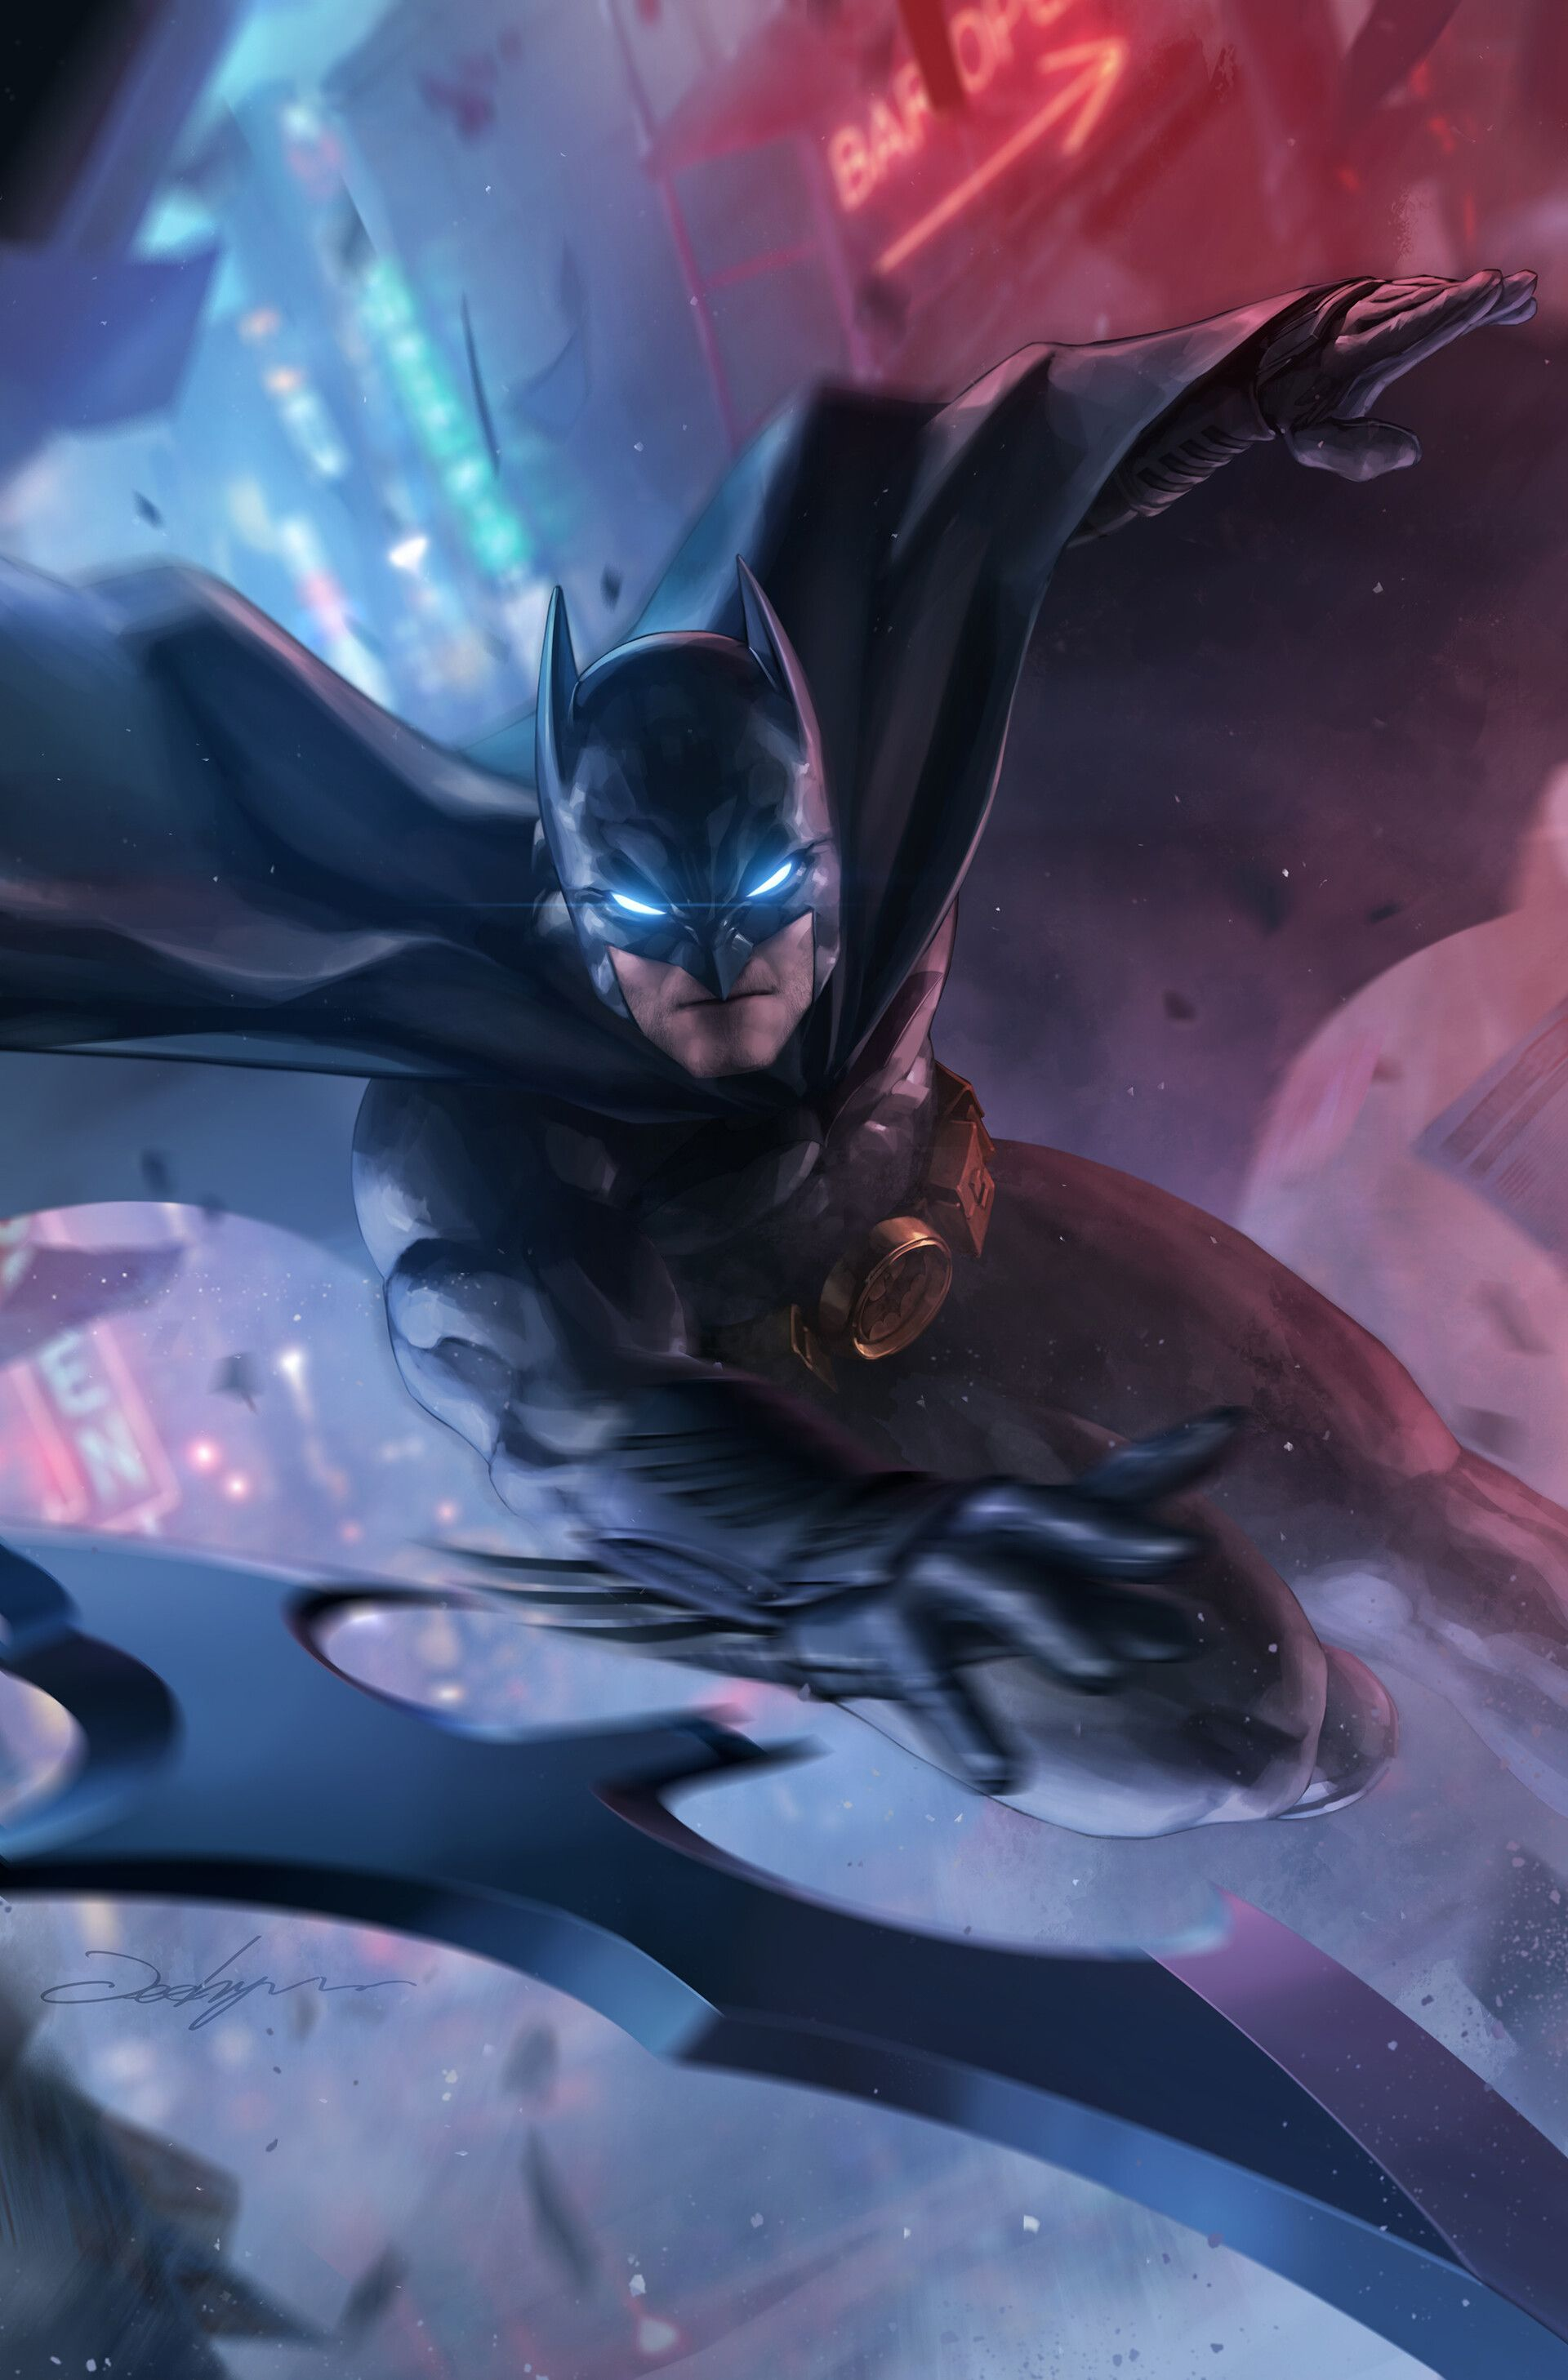 Dc Comics Comic Book Artwork Batman By Jee Hyung Lee Follow Us For More Awesome Comic Art Or Check Out Our Online St Batman Artwork Batman Comics